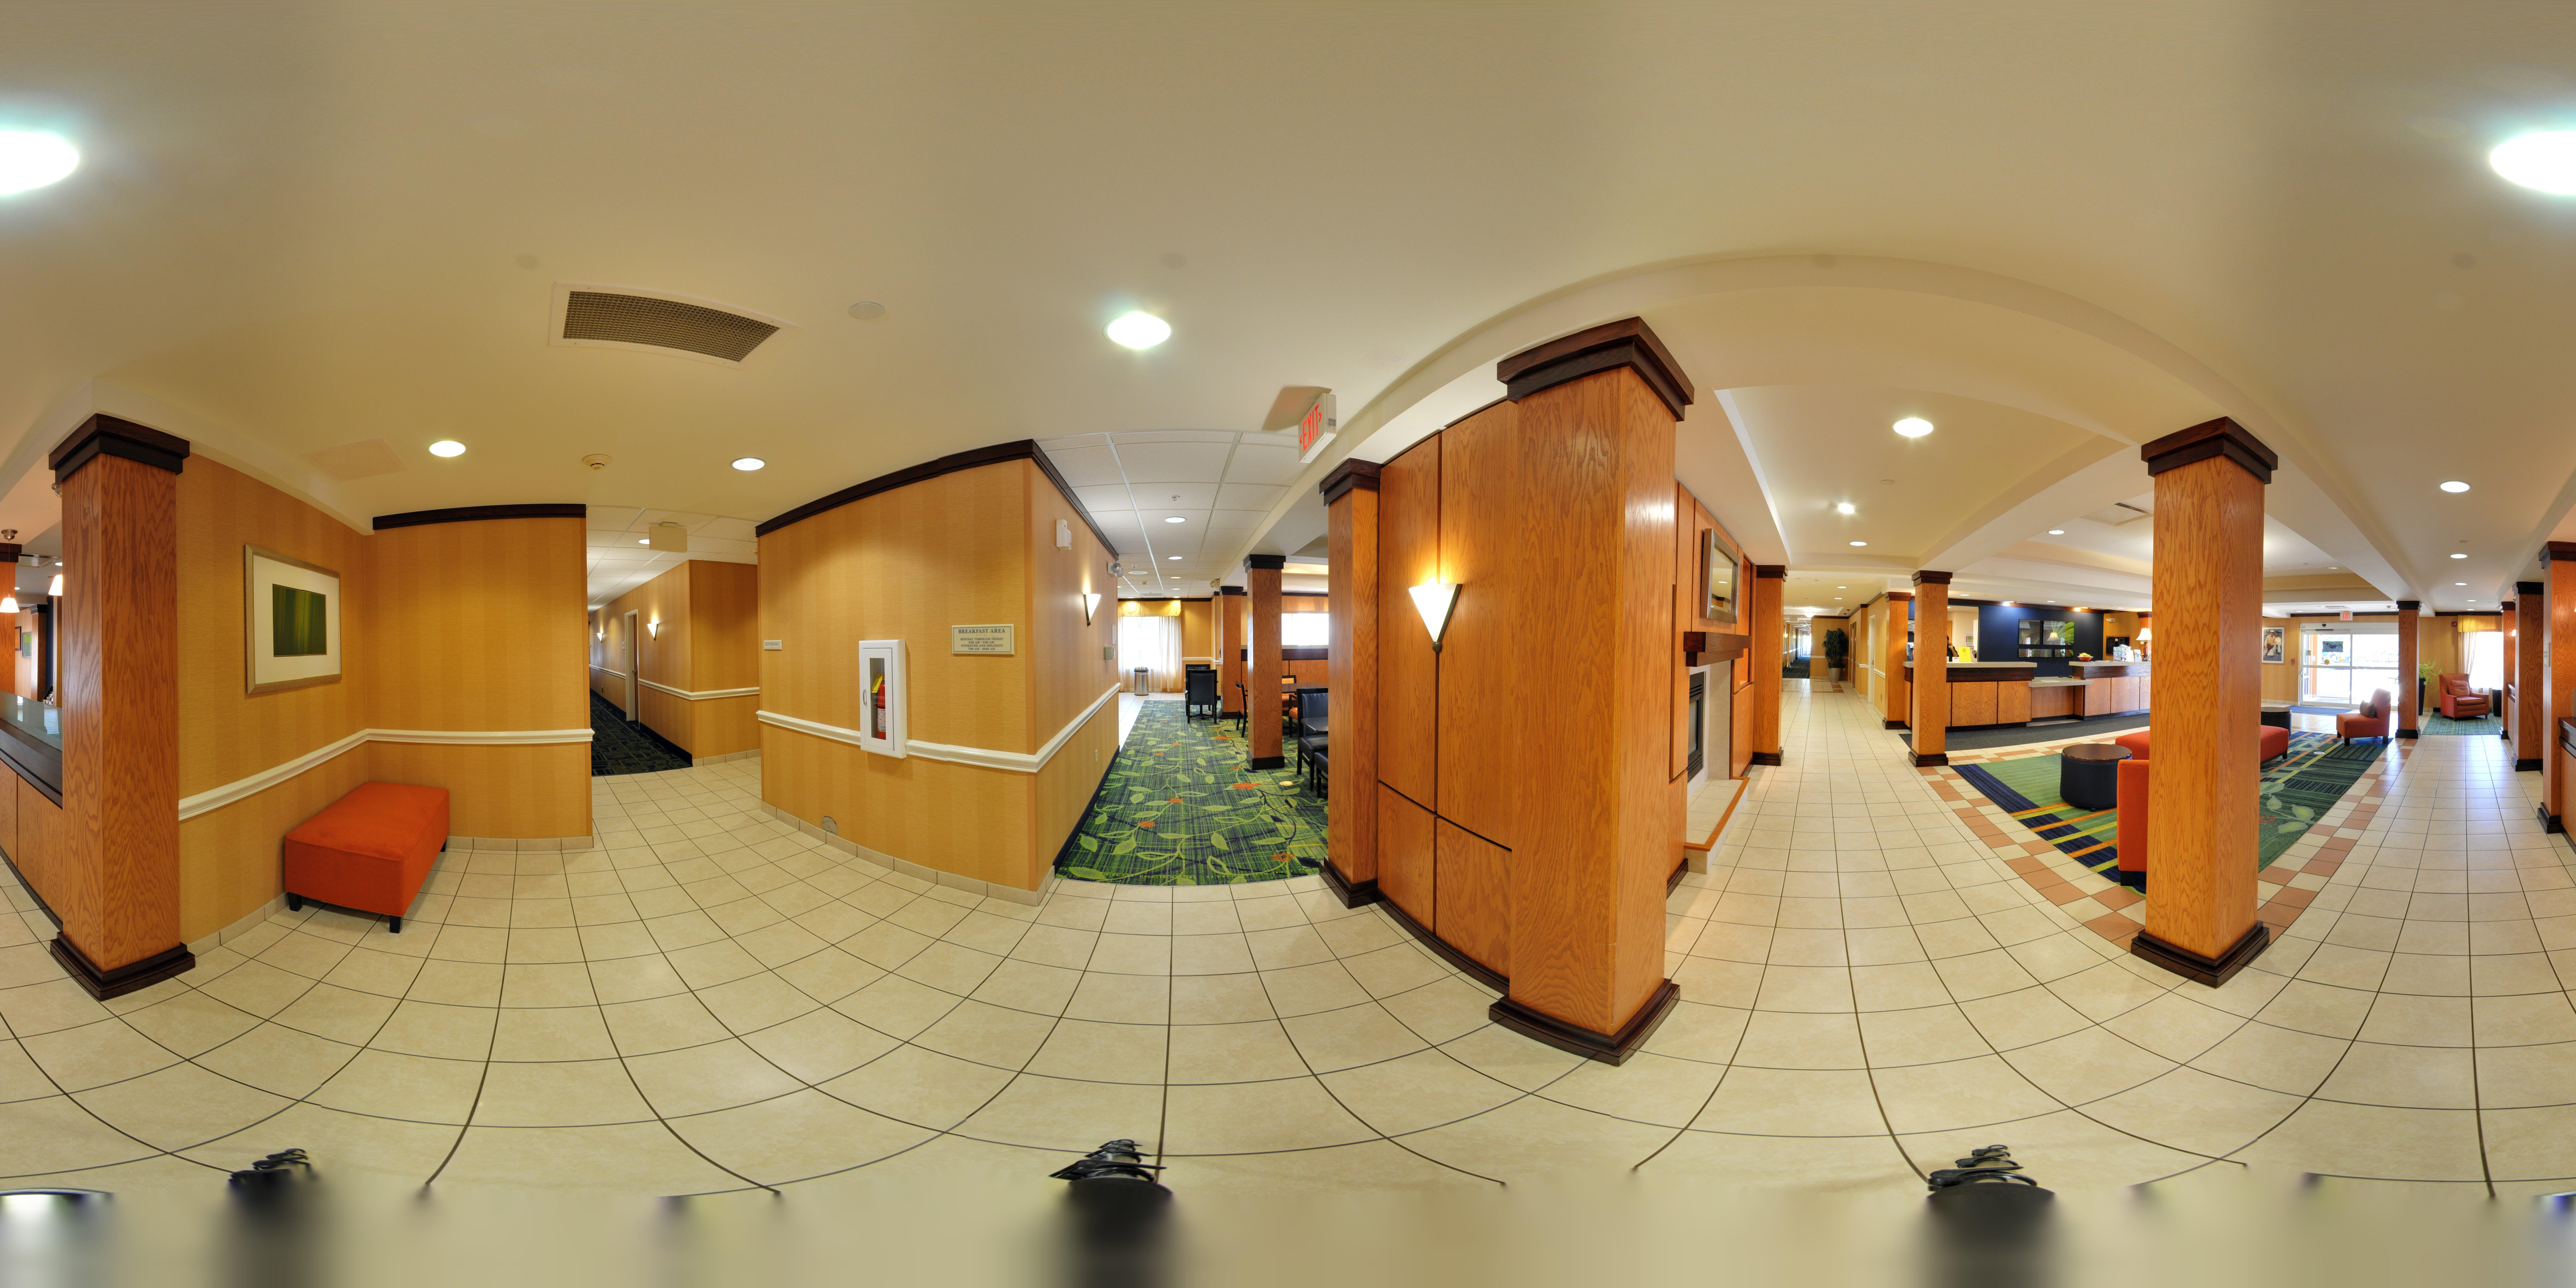 Fairfield Inn & Suites by Marriott Akron South image 20